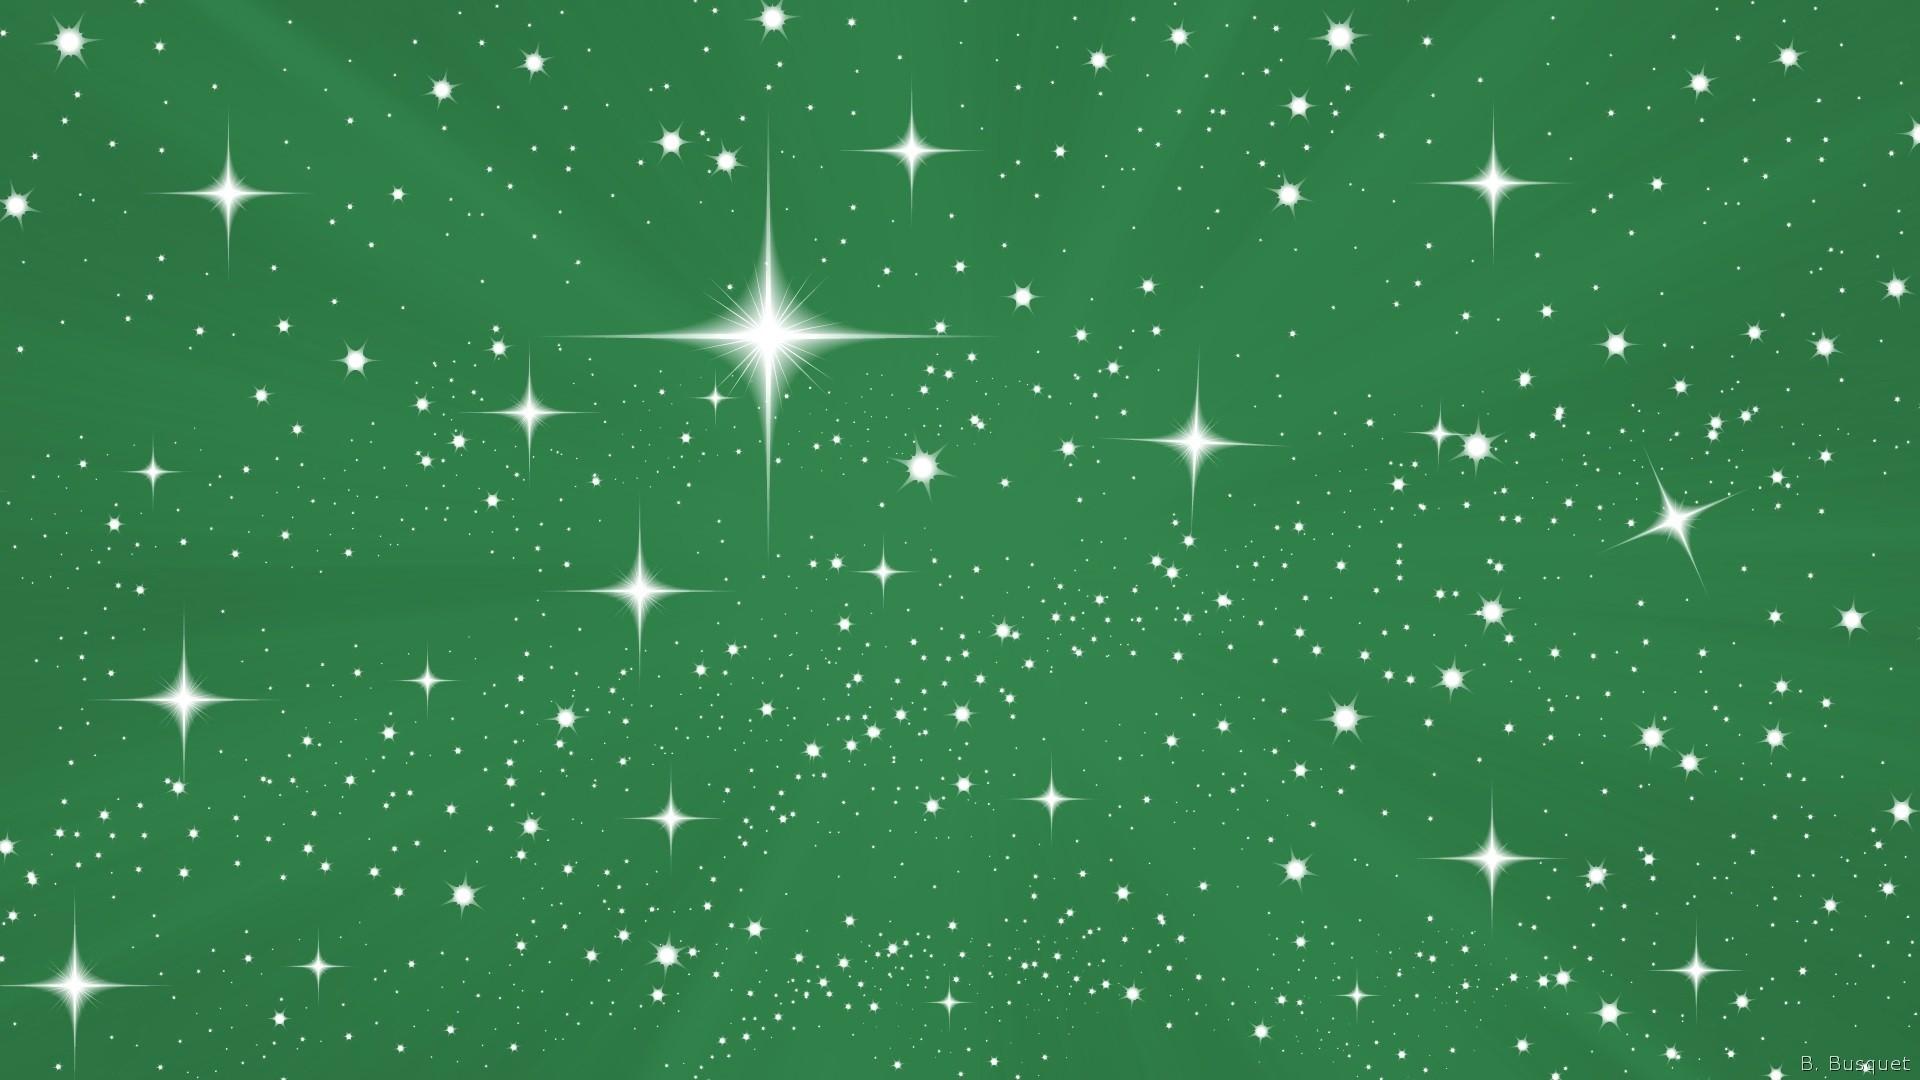 Green wallpapers - Barbaras HD Wallpapers